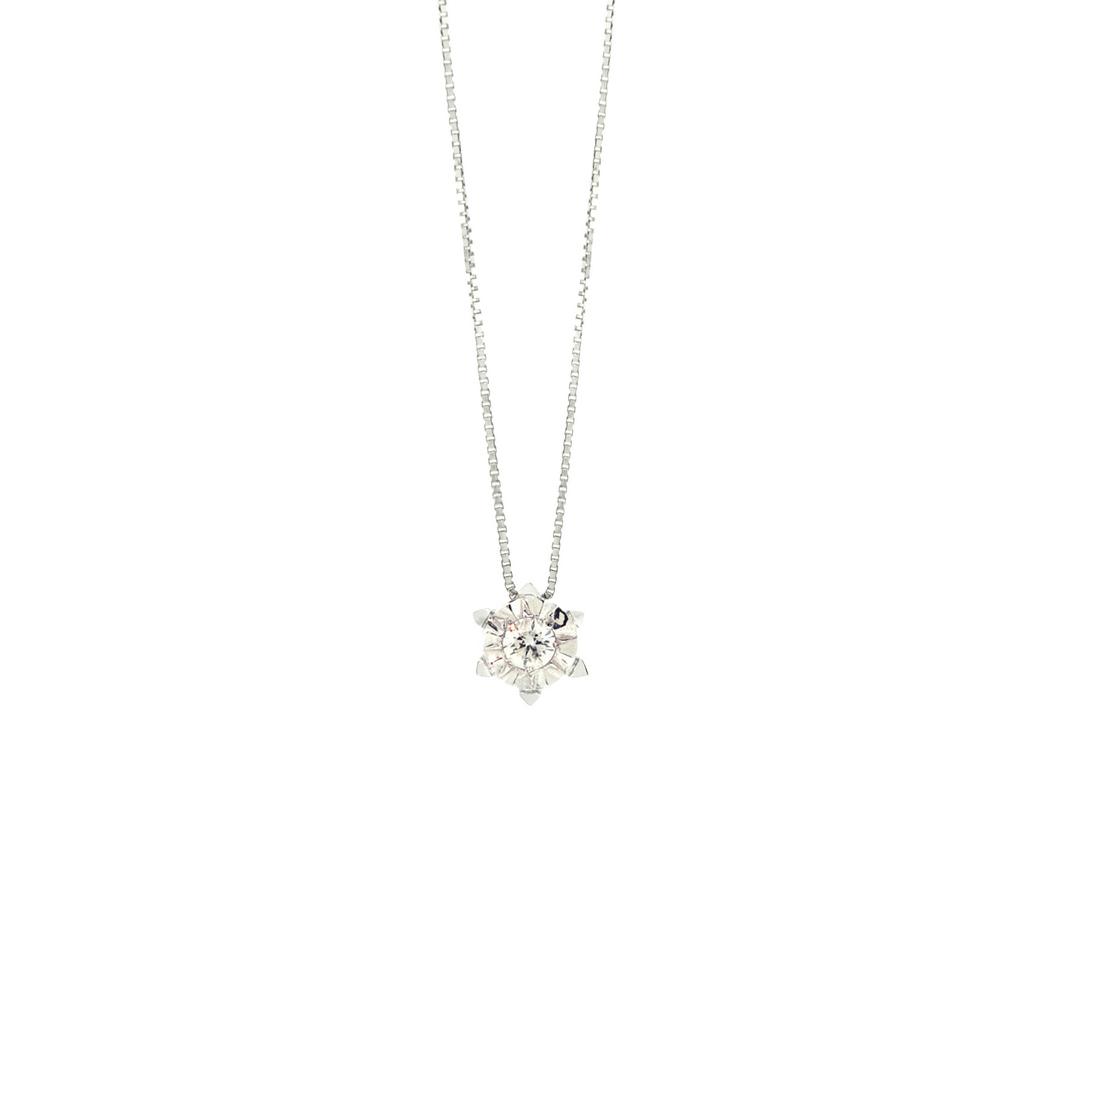 Gargantilha de Ouro Branco 18K Ponto de Luz de Diamante